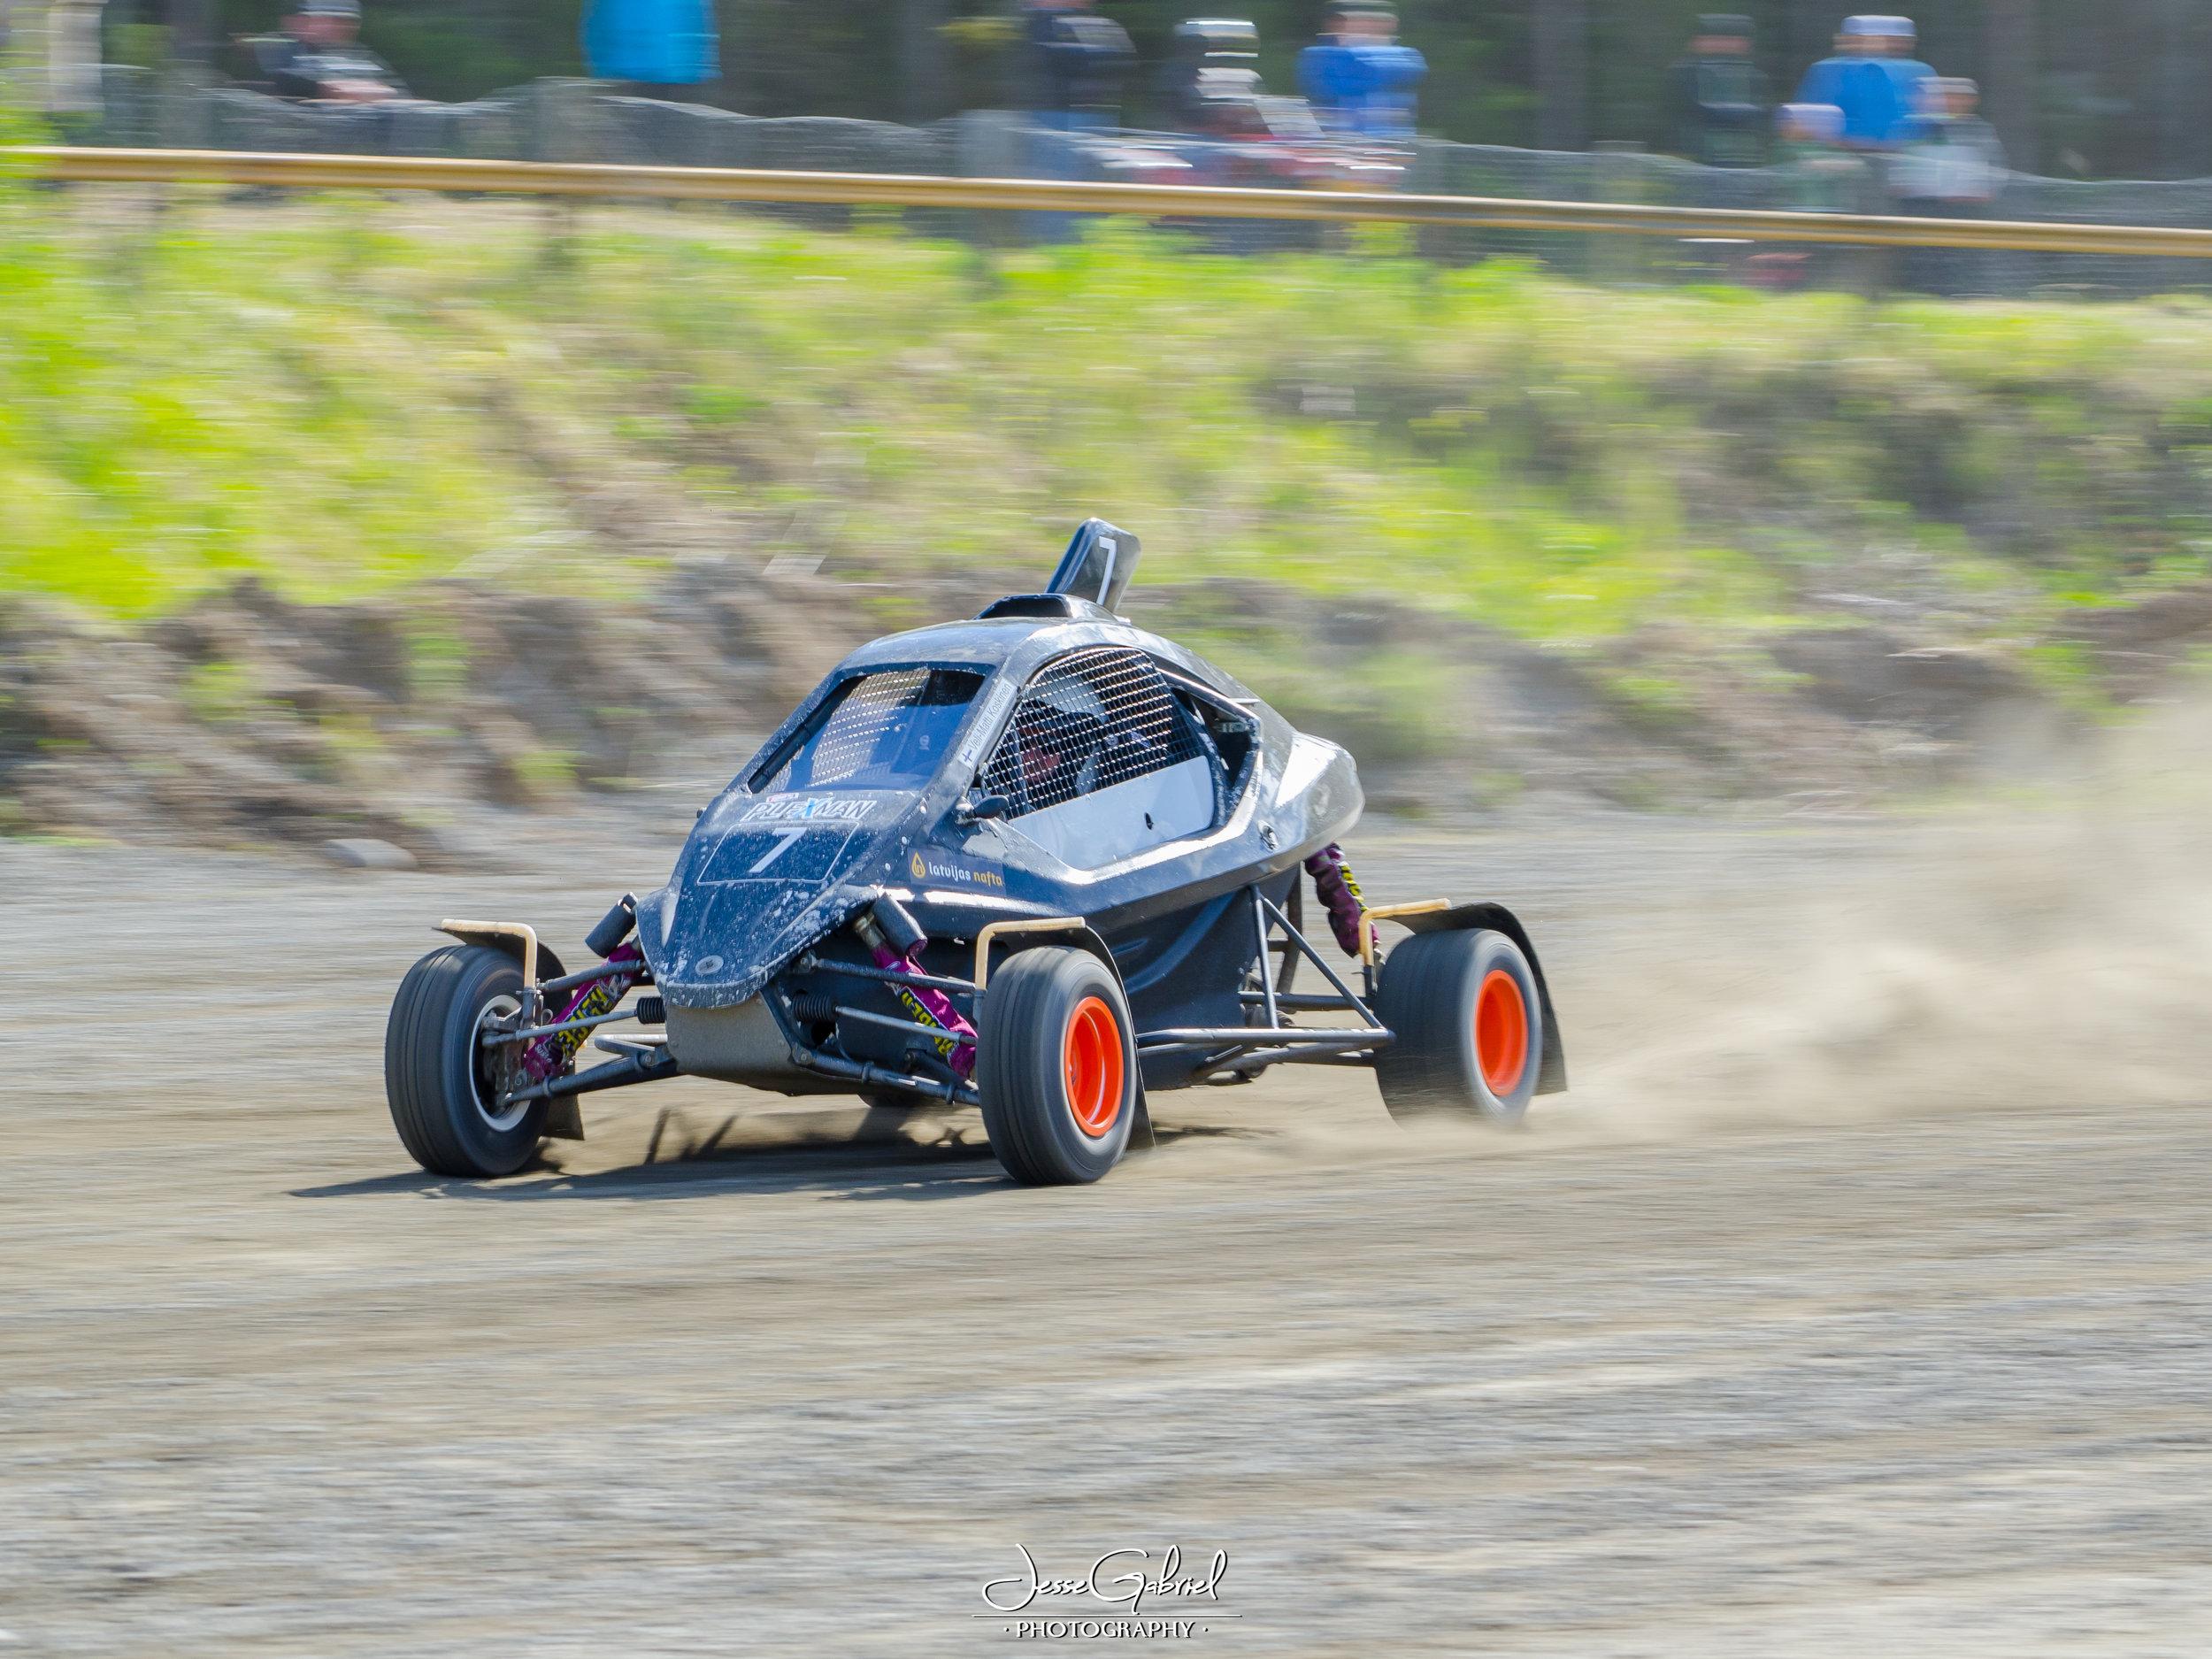 #7 Veli-Matti Koskinen - Seura: HyUAAuto: Speedcar Xtrem / Suzuki